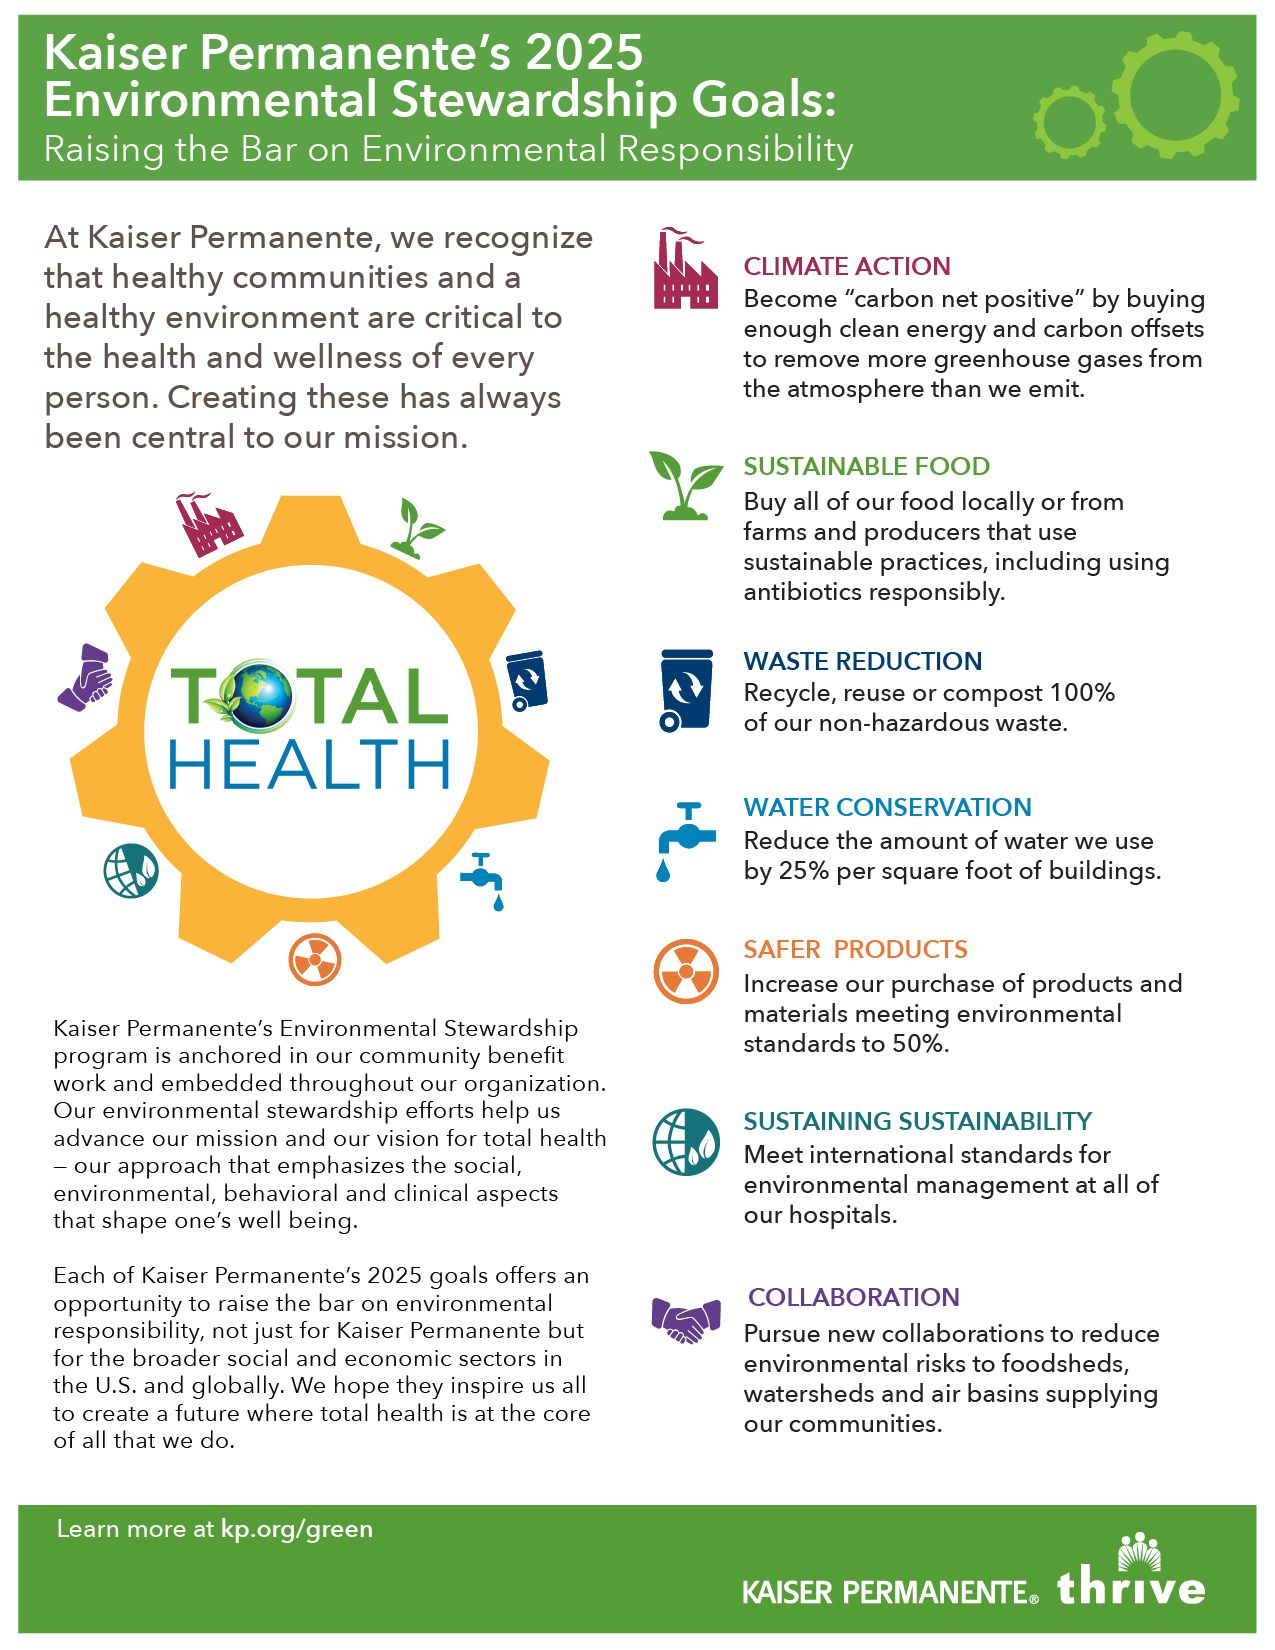 Environmental stewardship management infographic